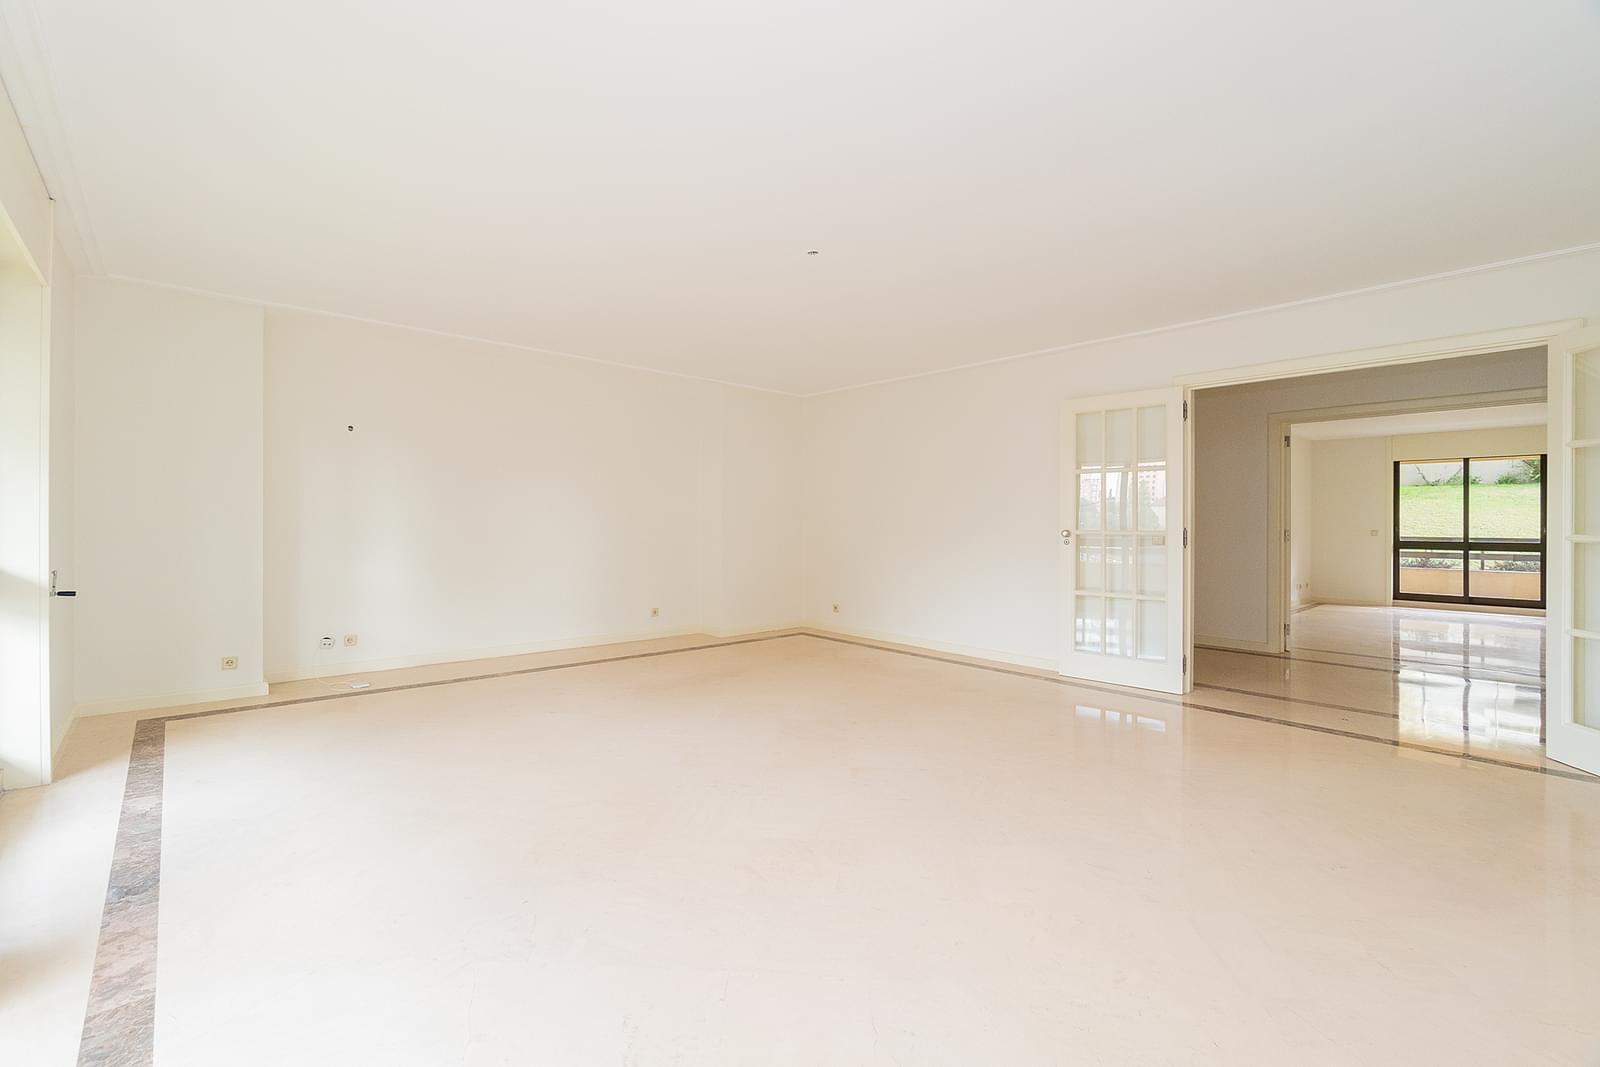 pf18551-apartamento-t3-1-lisboa-1eeb3dd8-f985-4b78-b5f3-b7d9532453da